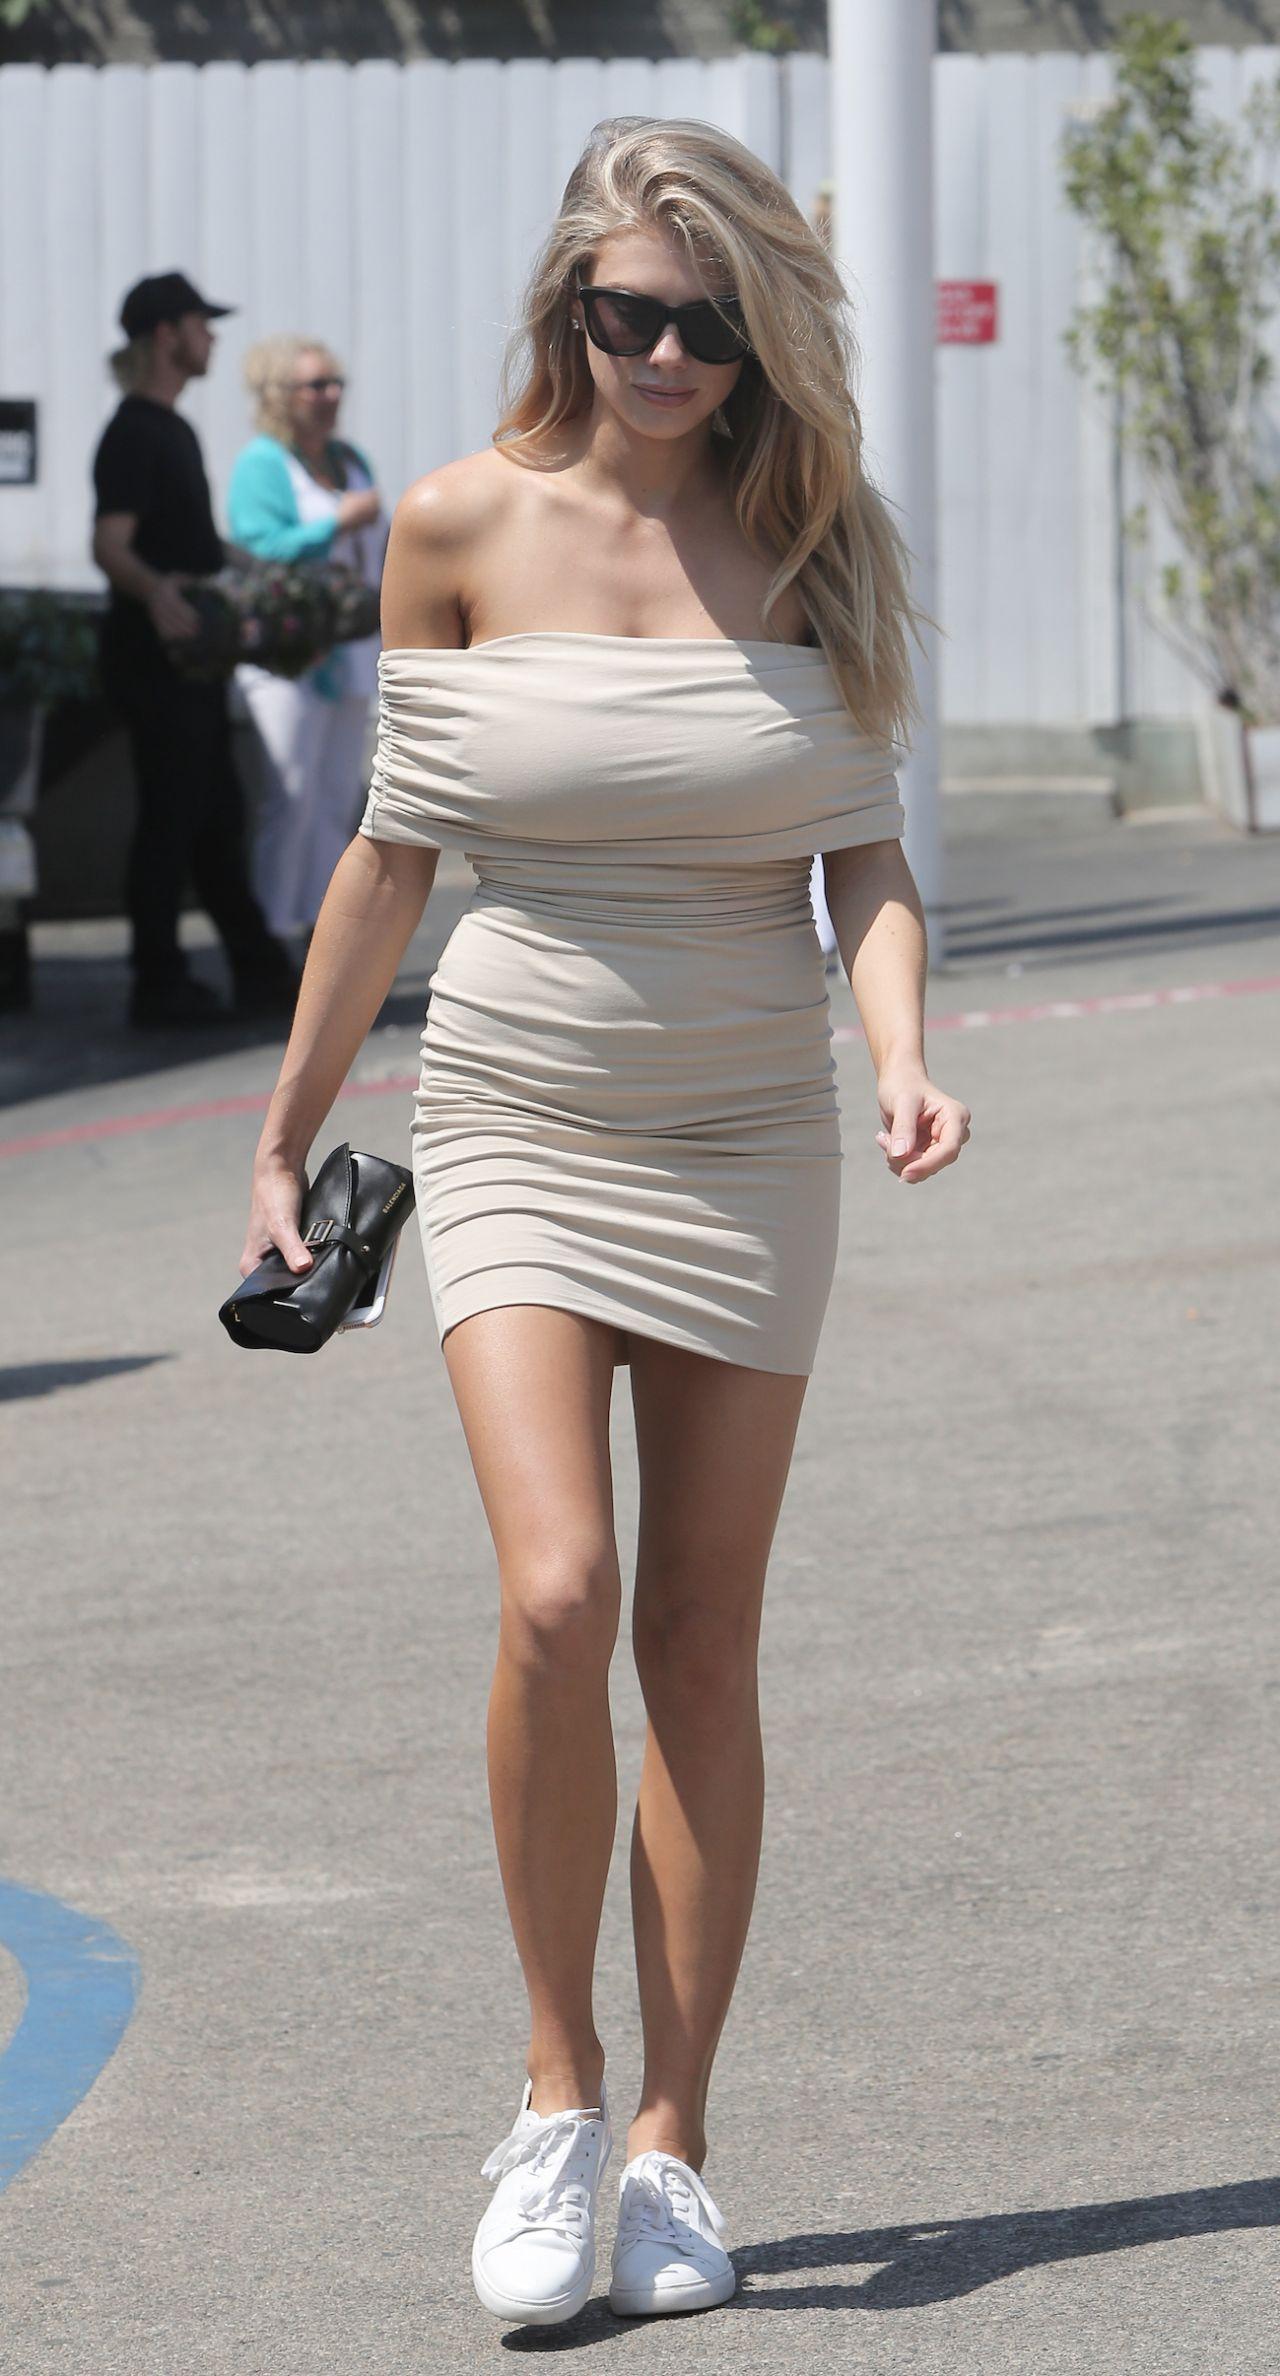 Charlotte Mckinney Hot In Summer Mini Dress Malibu 7 31 2016